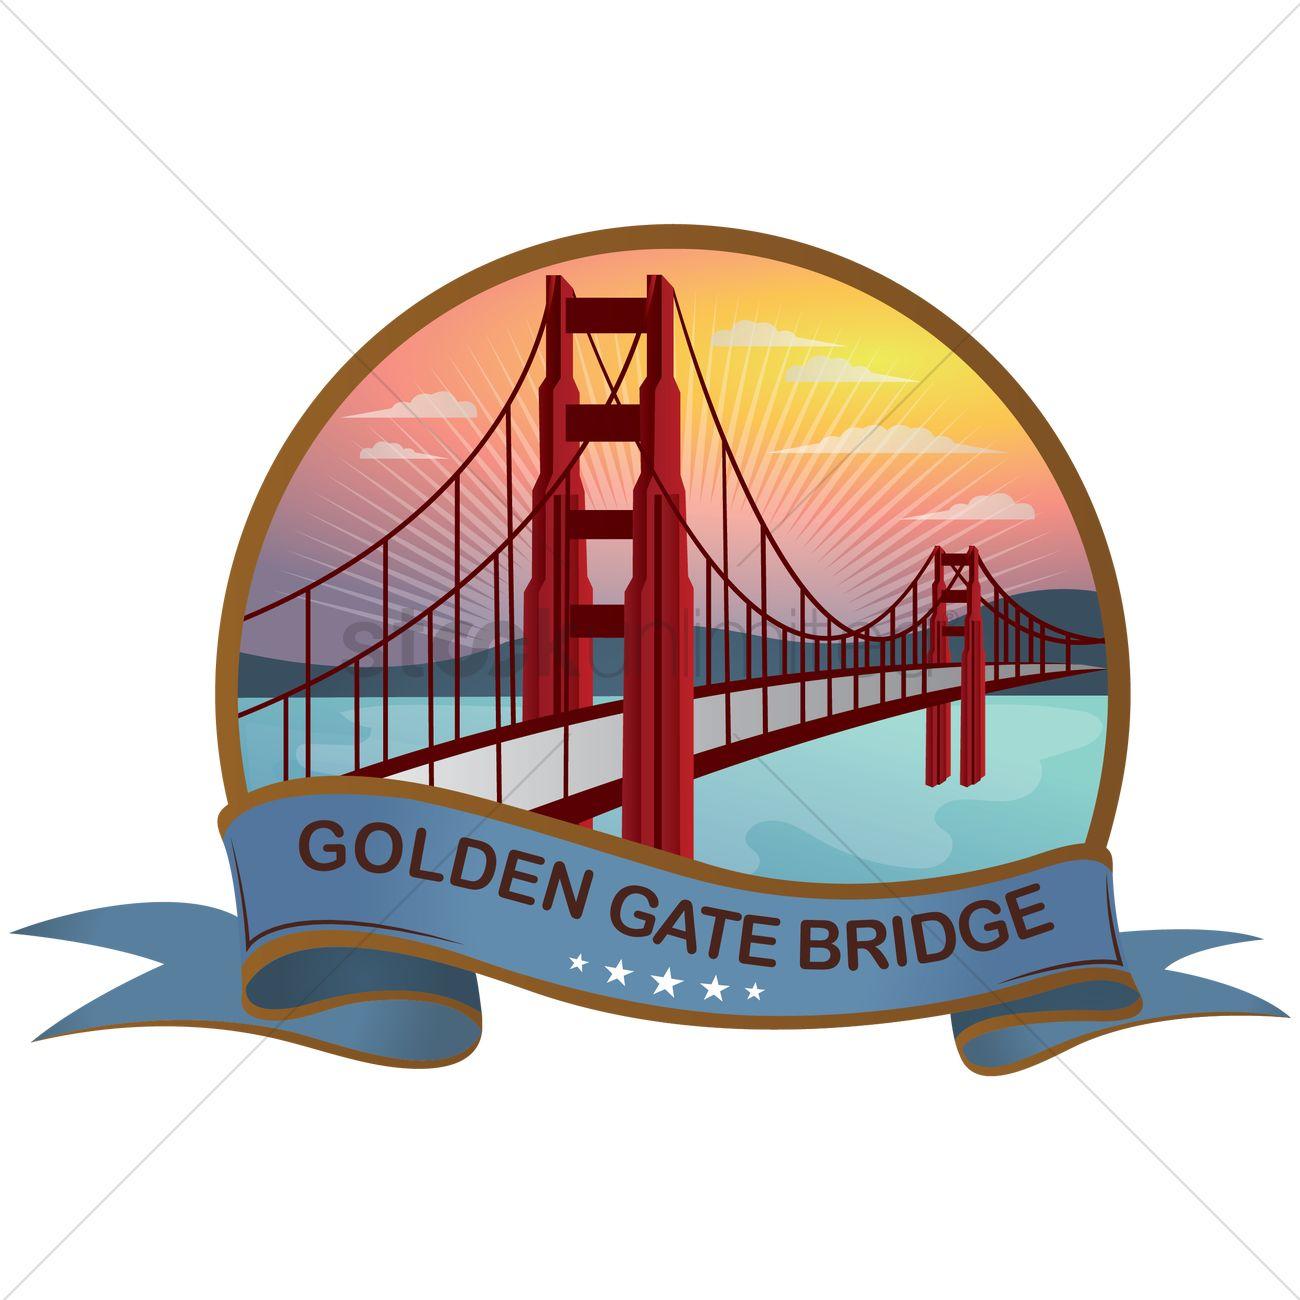 Golden Gate Bridge Drawing Clip Art at GetDrawings.com.